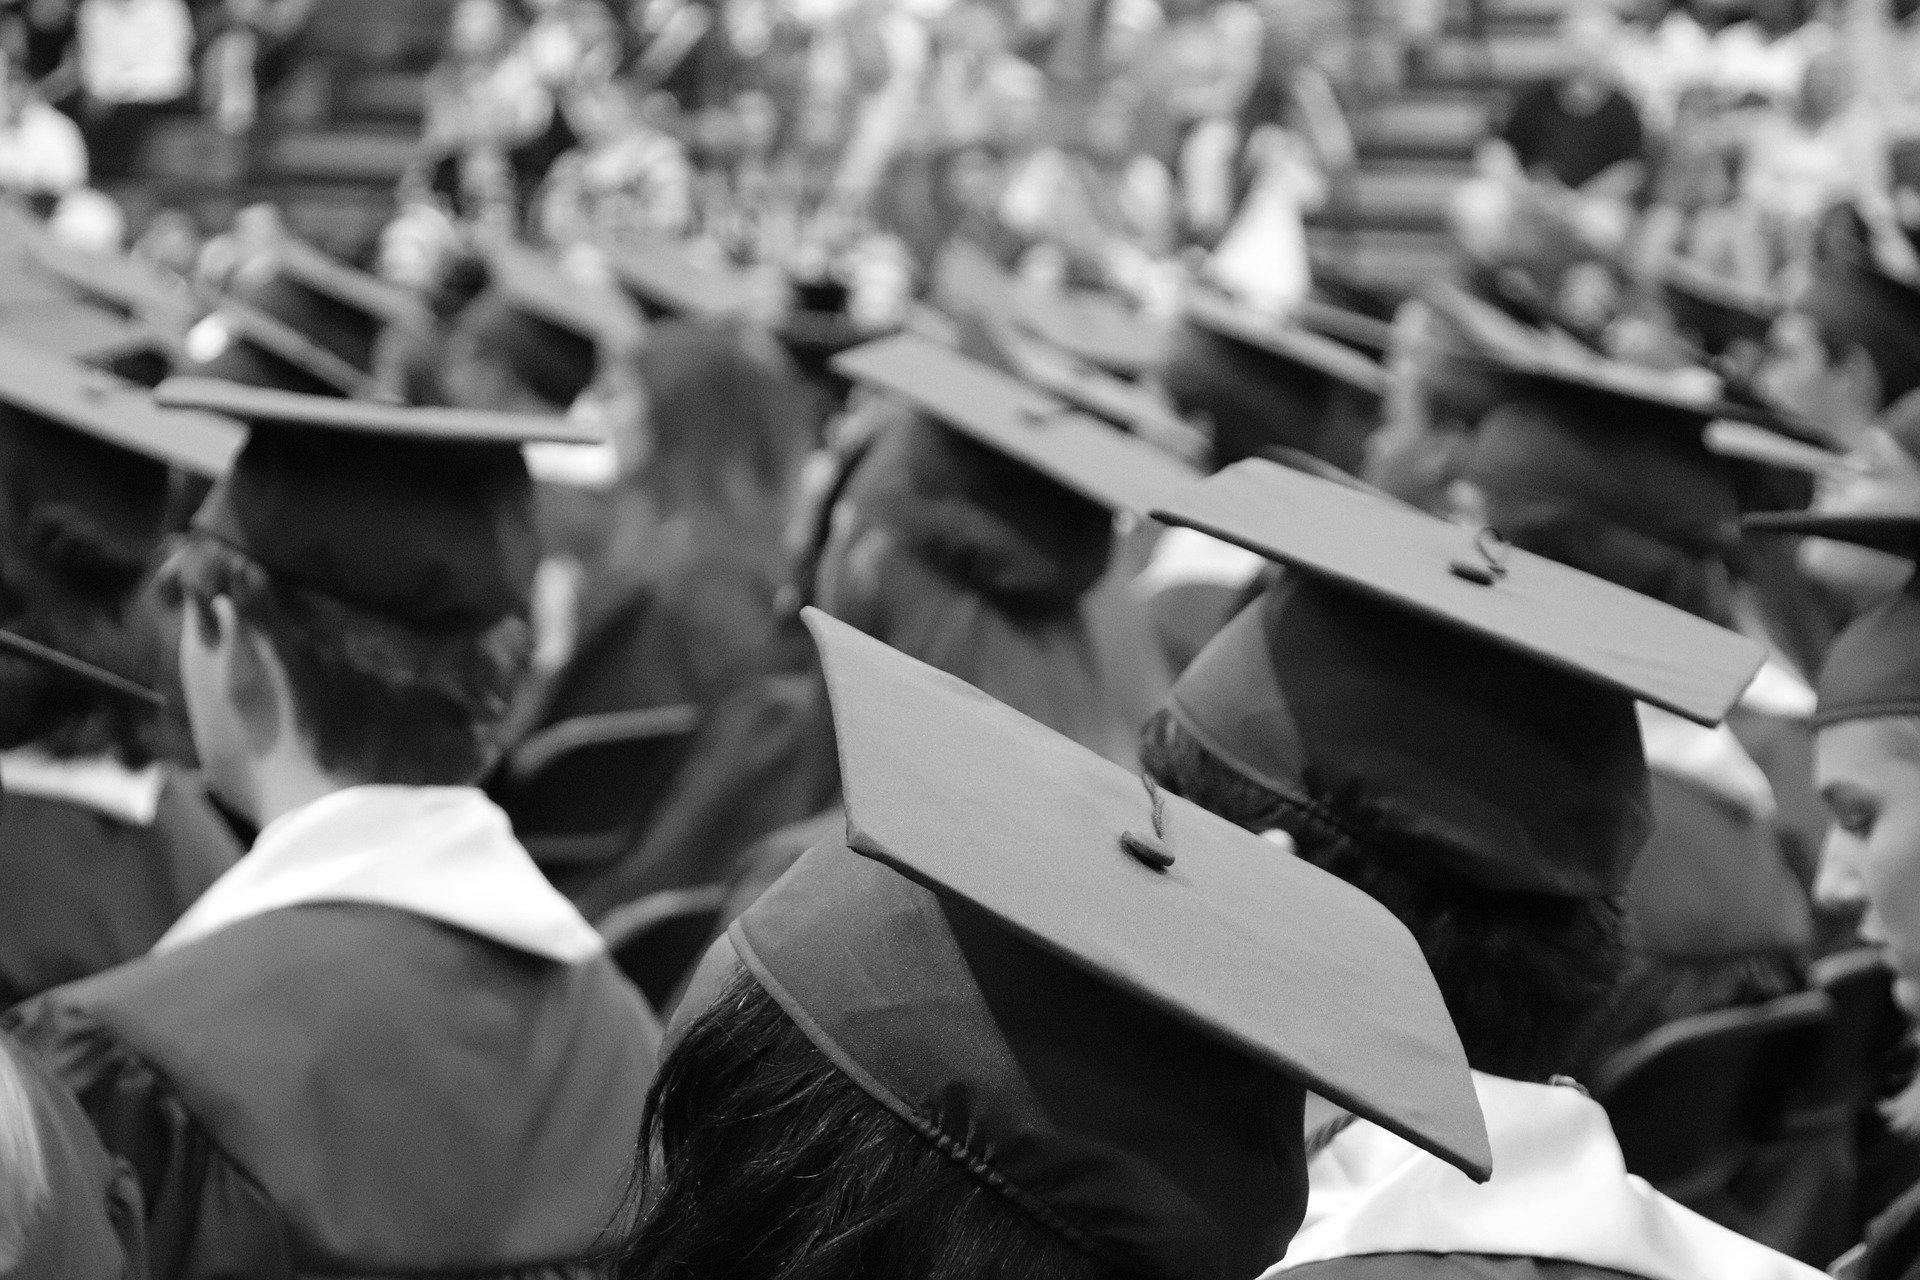 Students wearing graduation caps